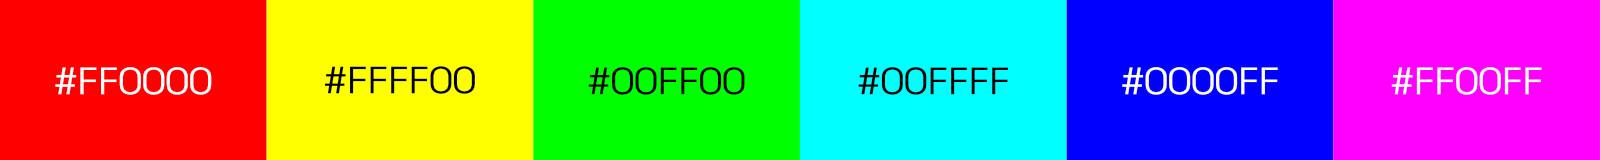 sRGB Color Primaries Test for Web Color Management